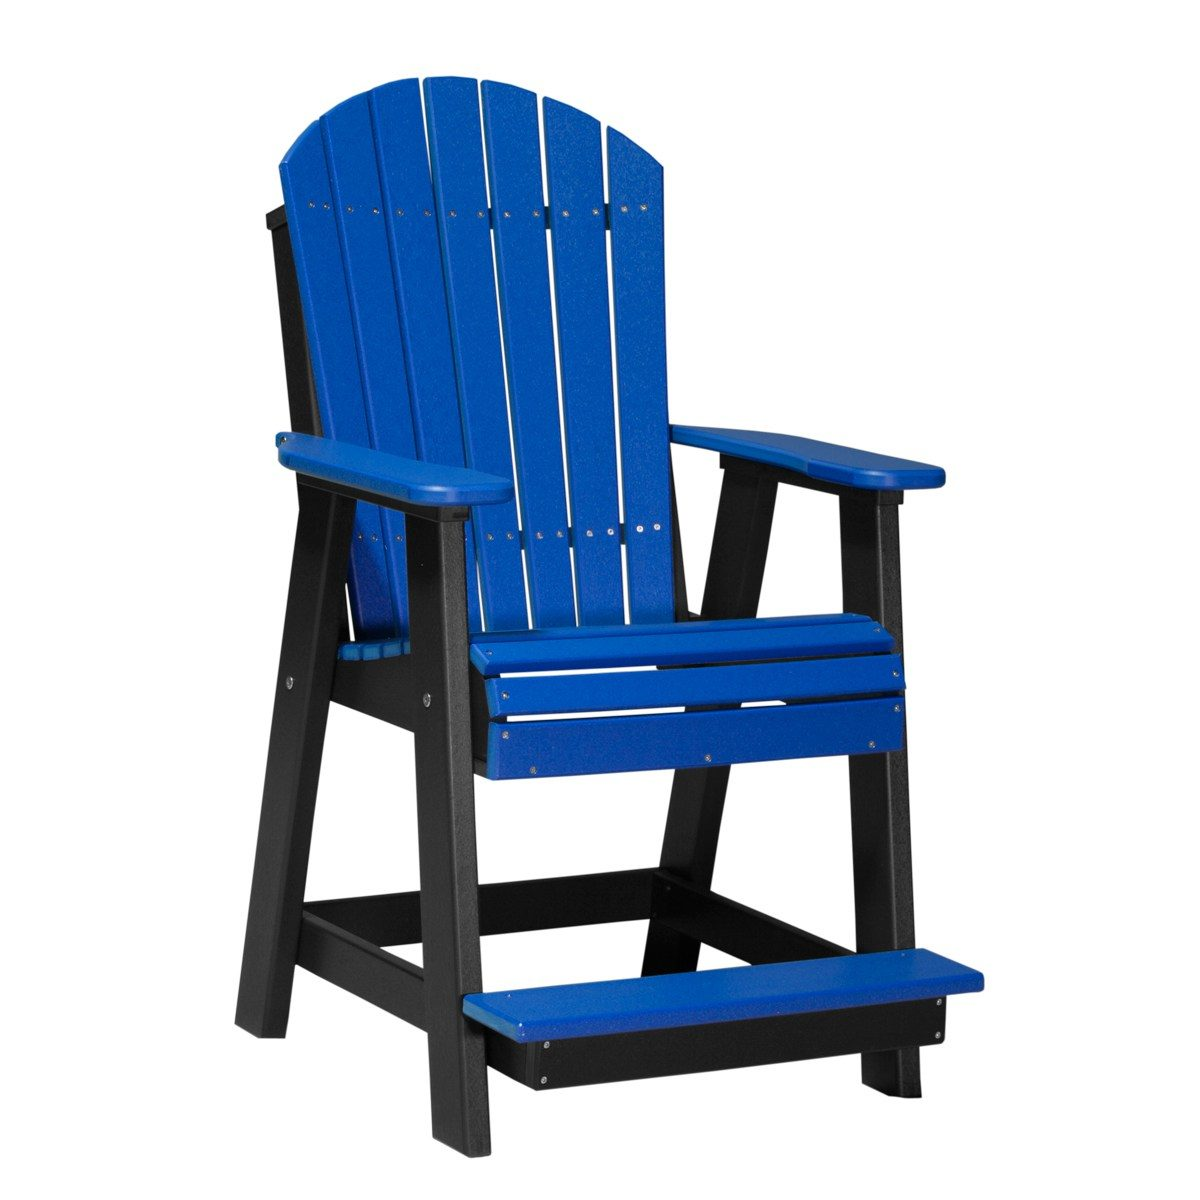 Adirondack Balcony Chair - Blue & Black